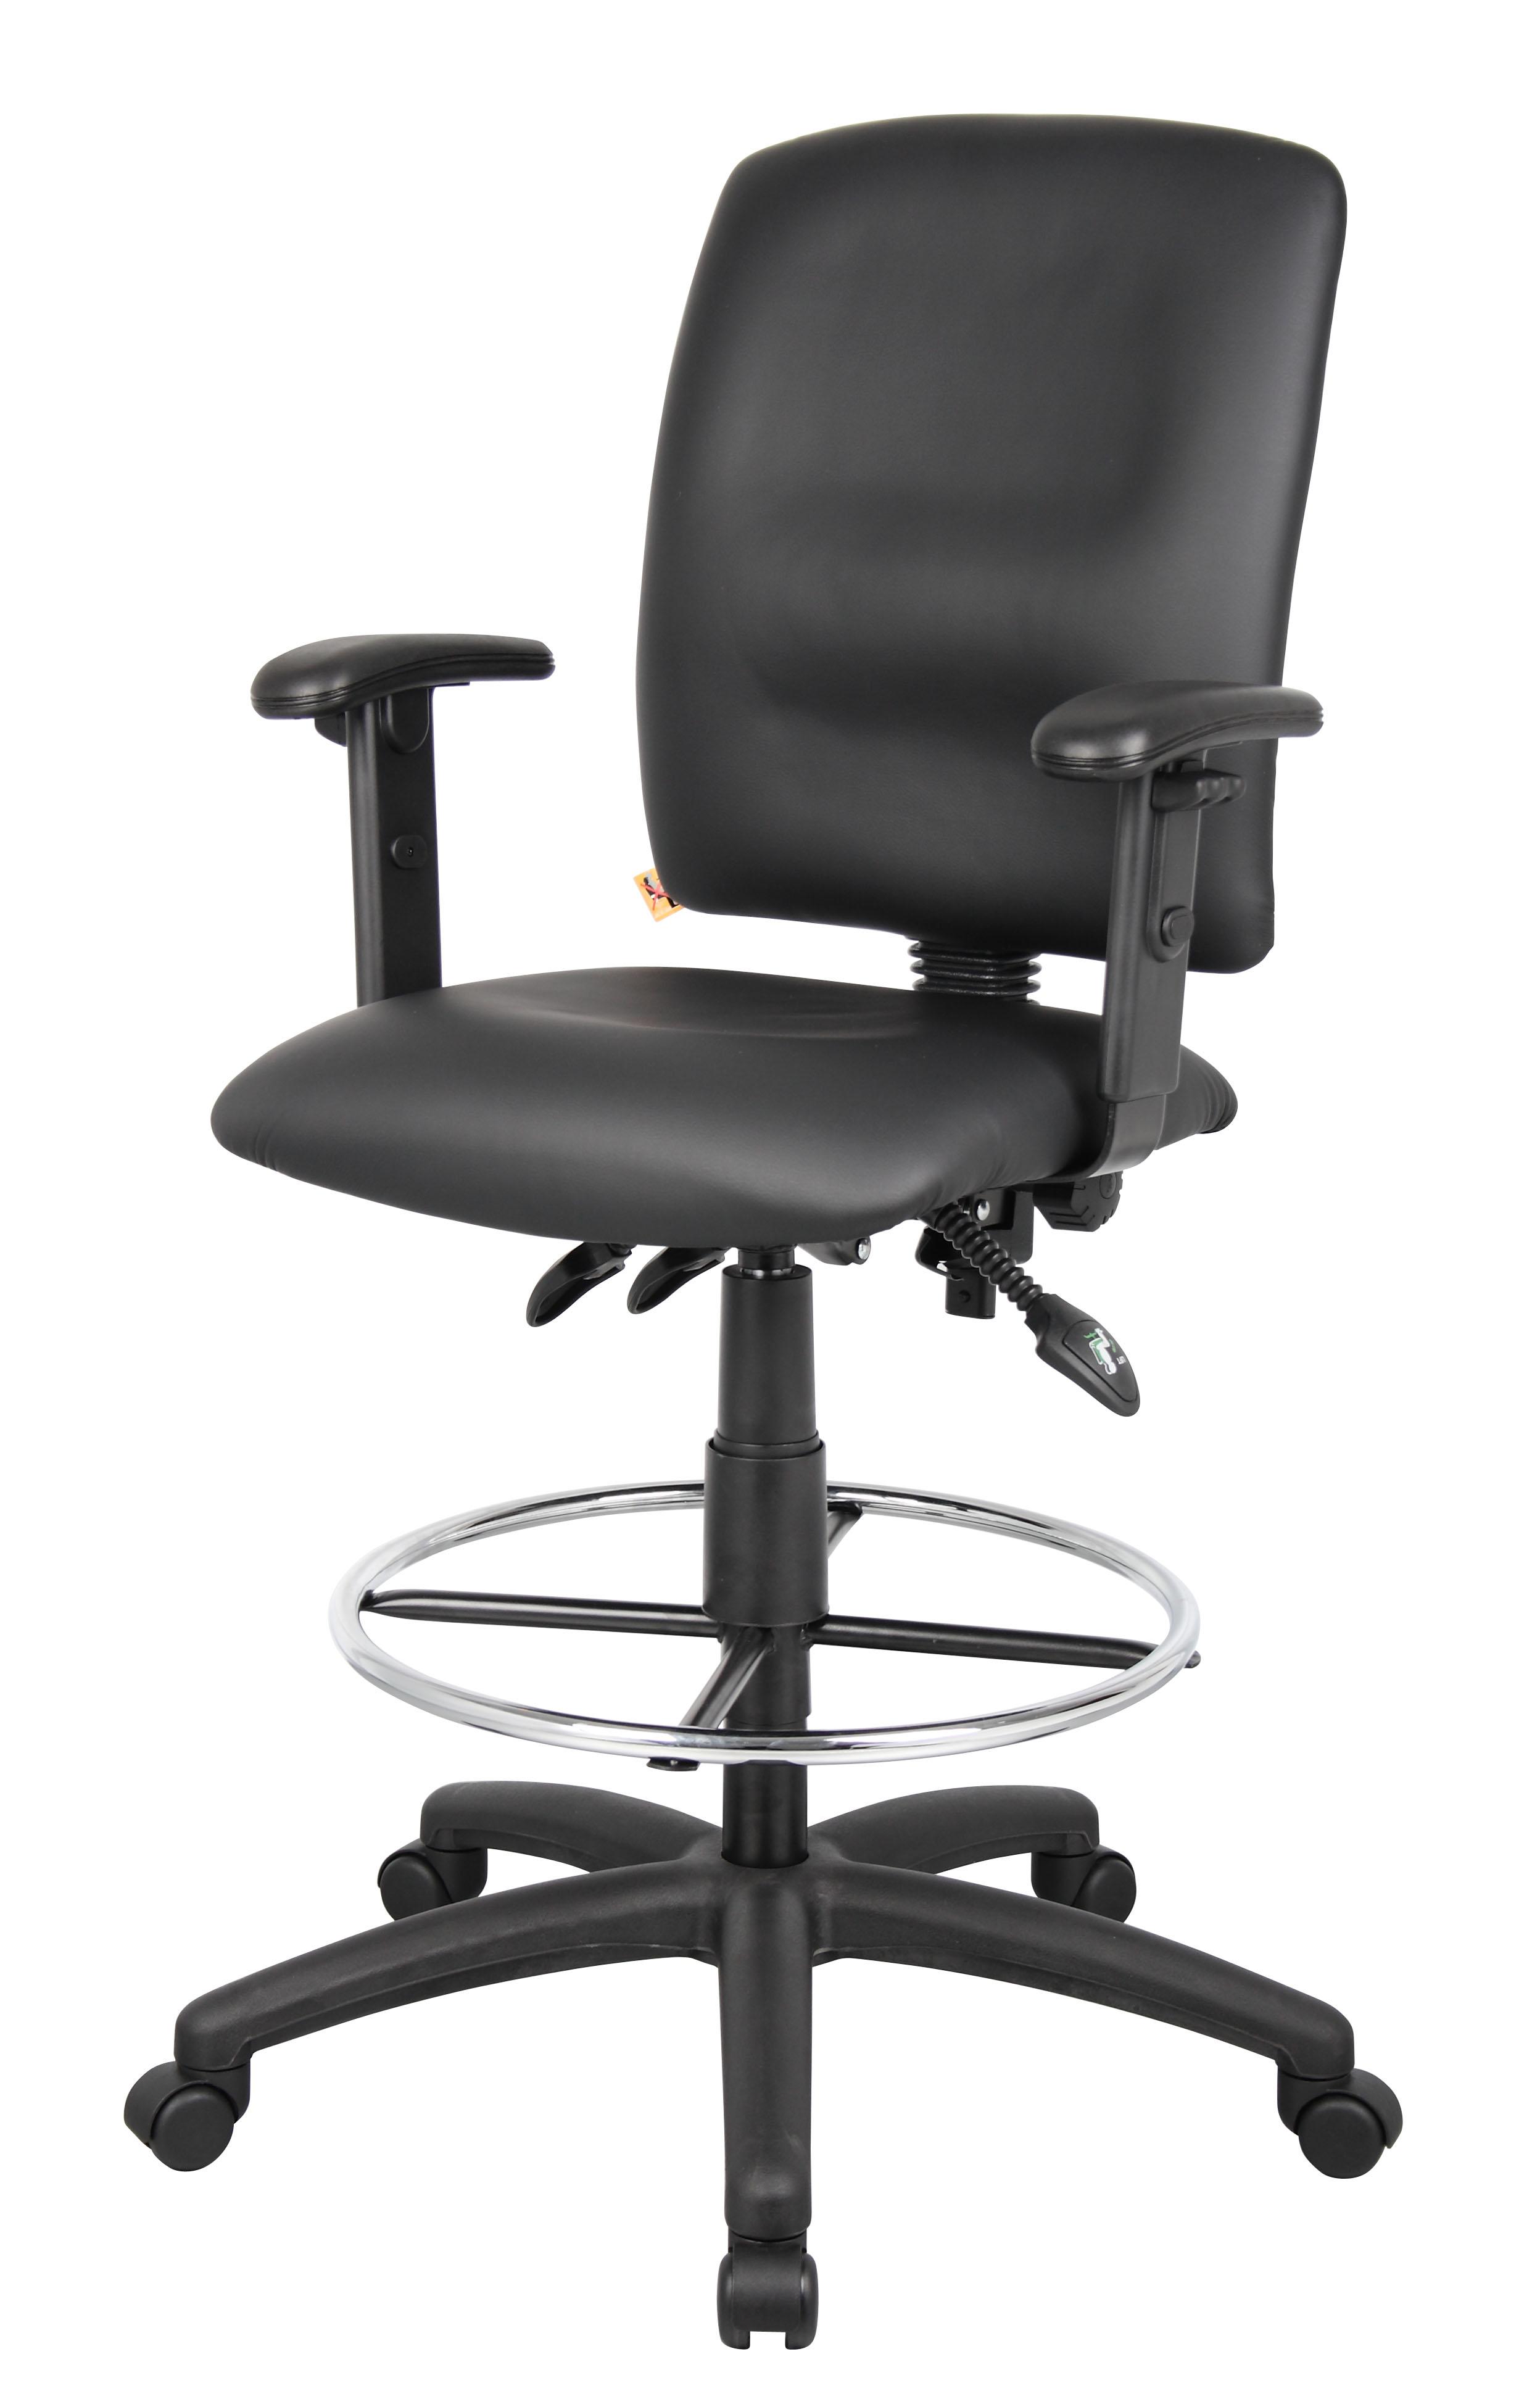 Astounding Boss Multi Function Leatherplus Drafting Stool W Adjustable Arms Creativecarmelina Interior Chair Design Creativecarmelinacom